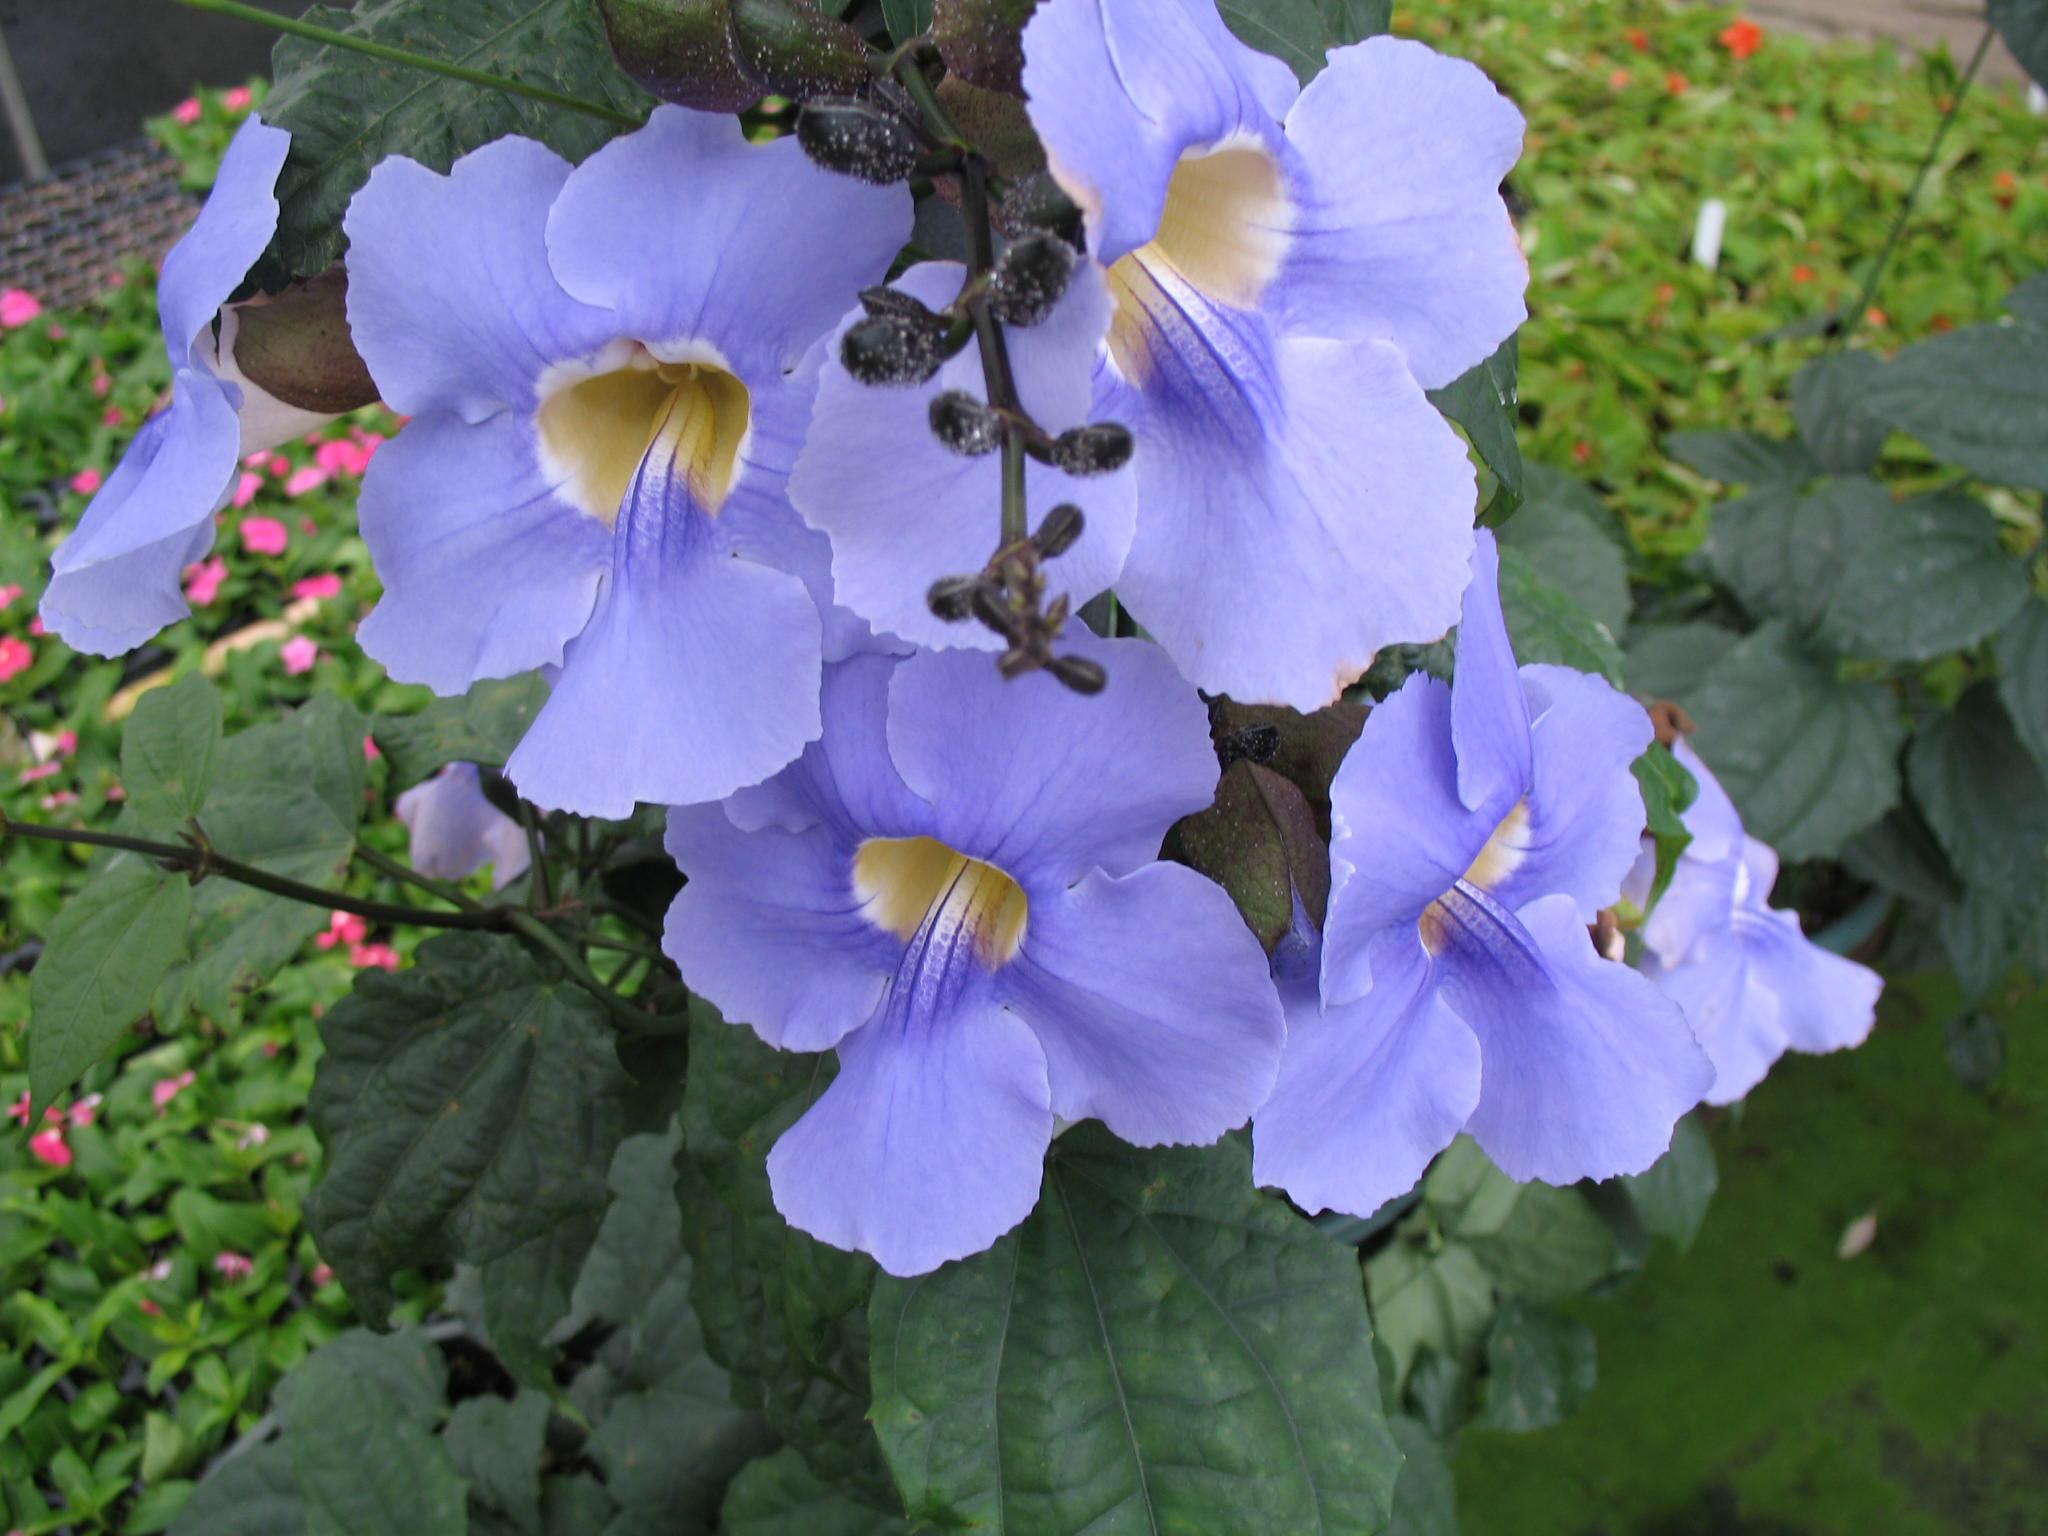 Thunbergia grandiflora / Thunbergia grandiflora